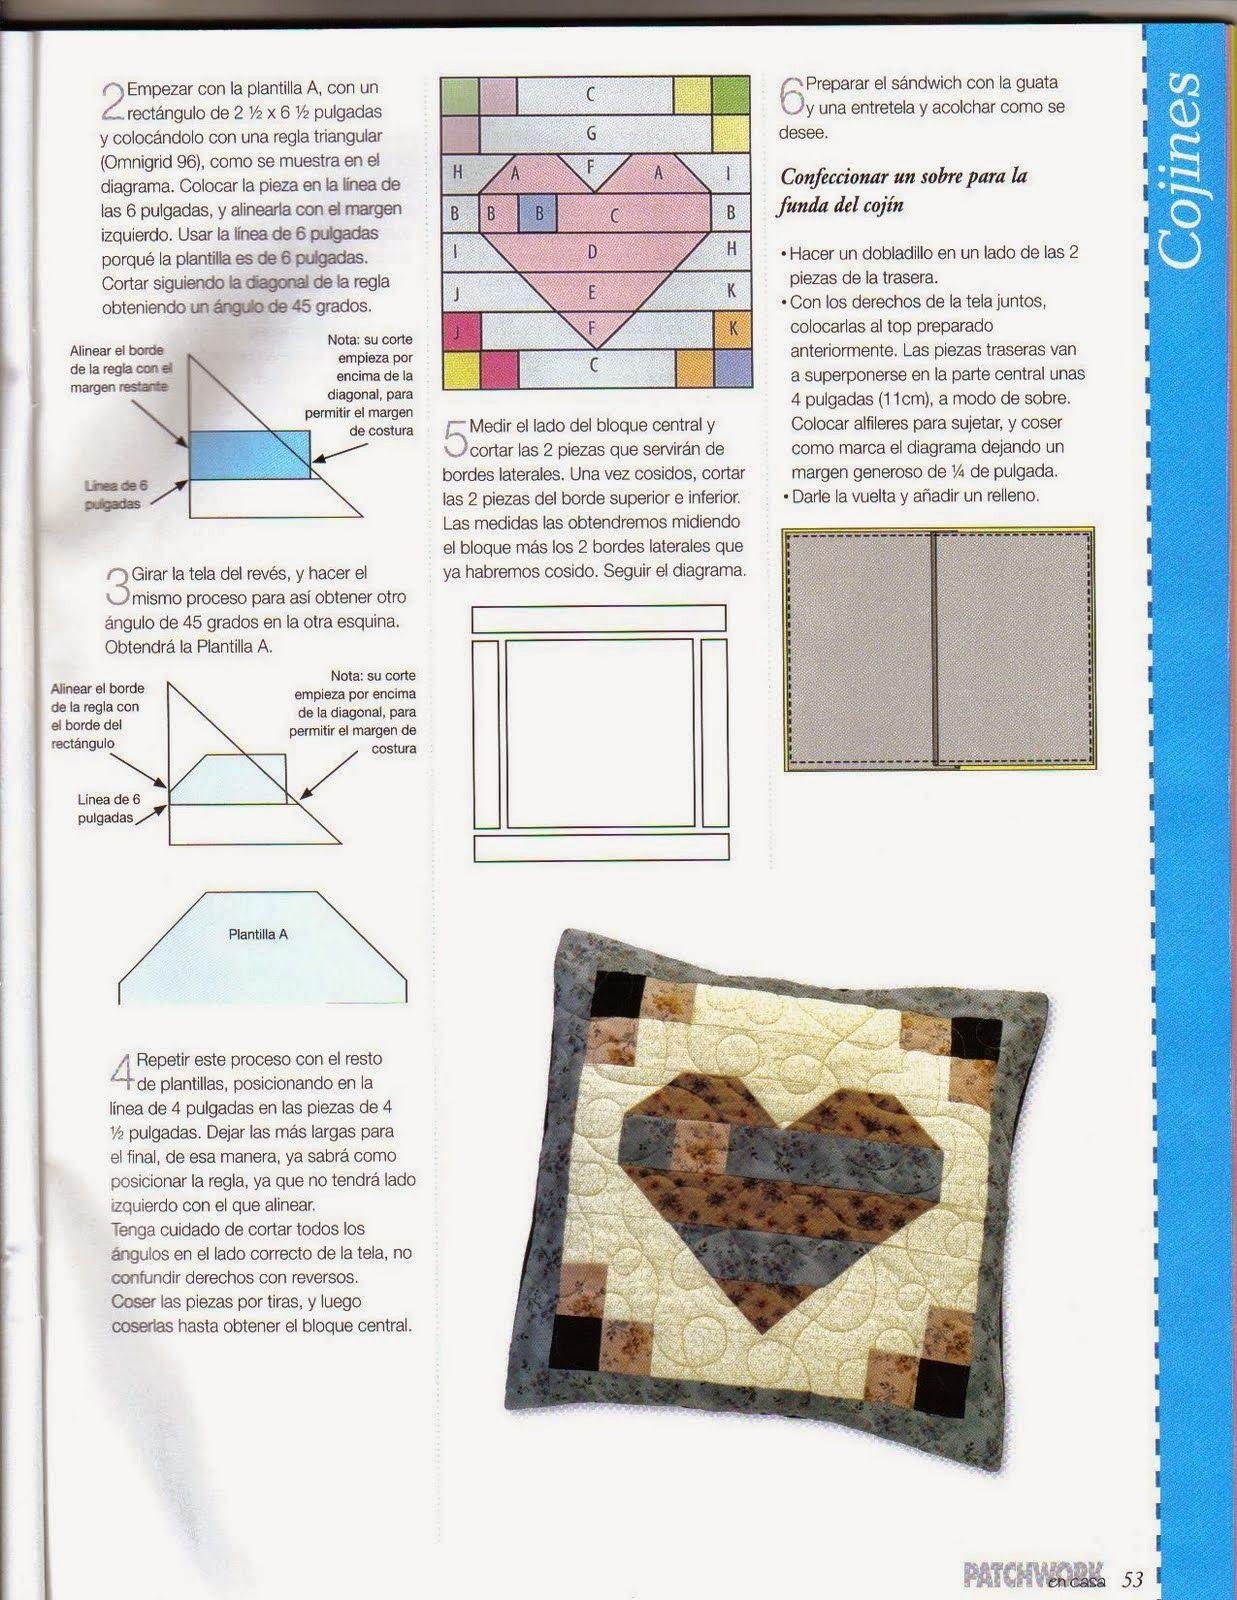 revistas de manualidades gratis | brendan | Pinterest | Revistas de ...